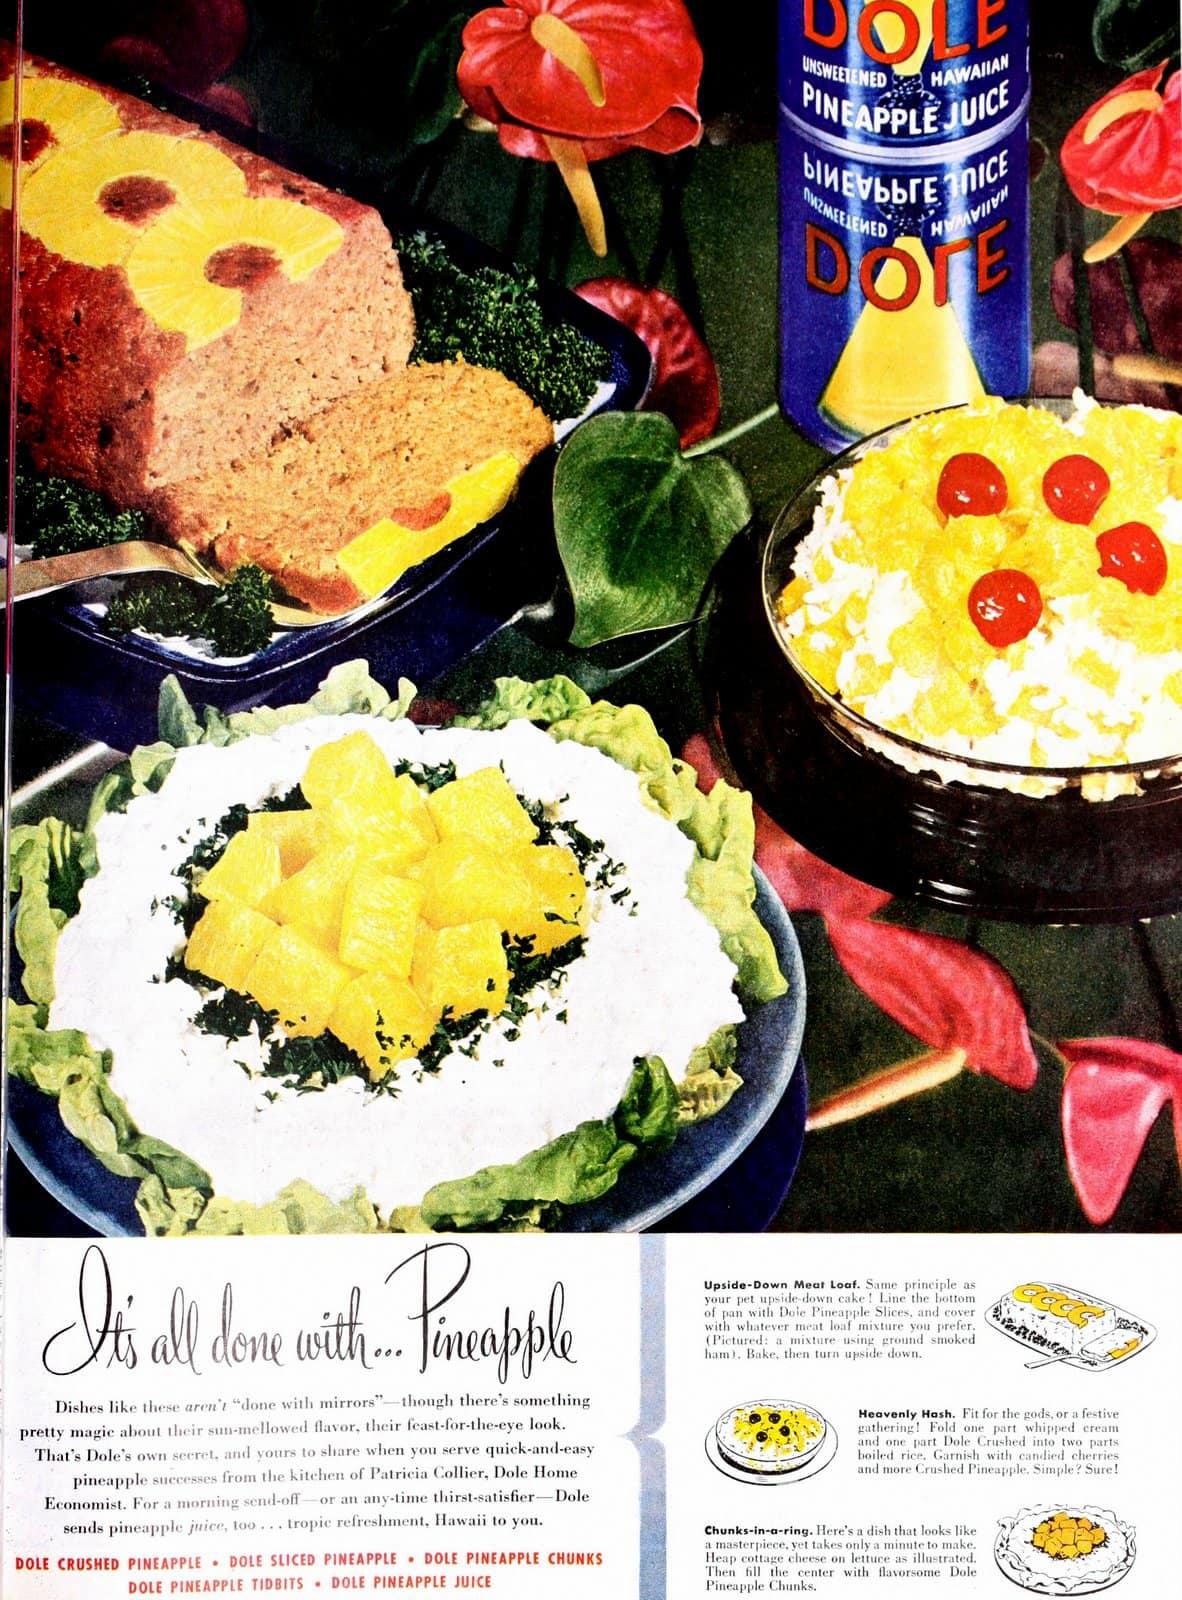 Easy pineapple recipes (1947)